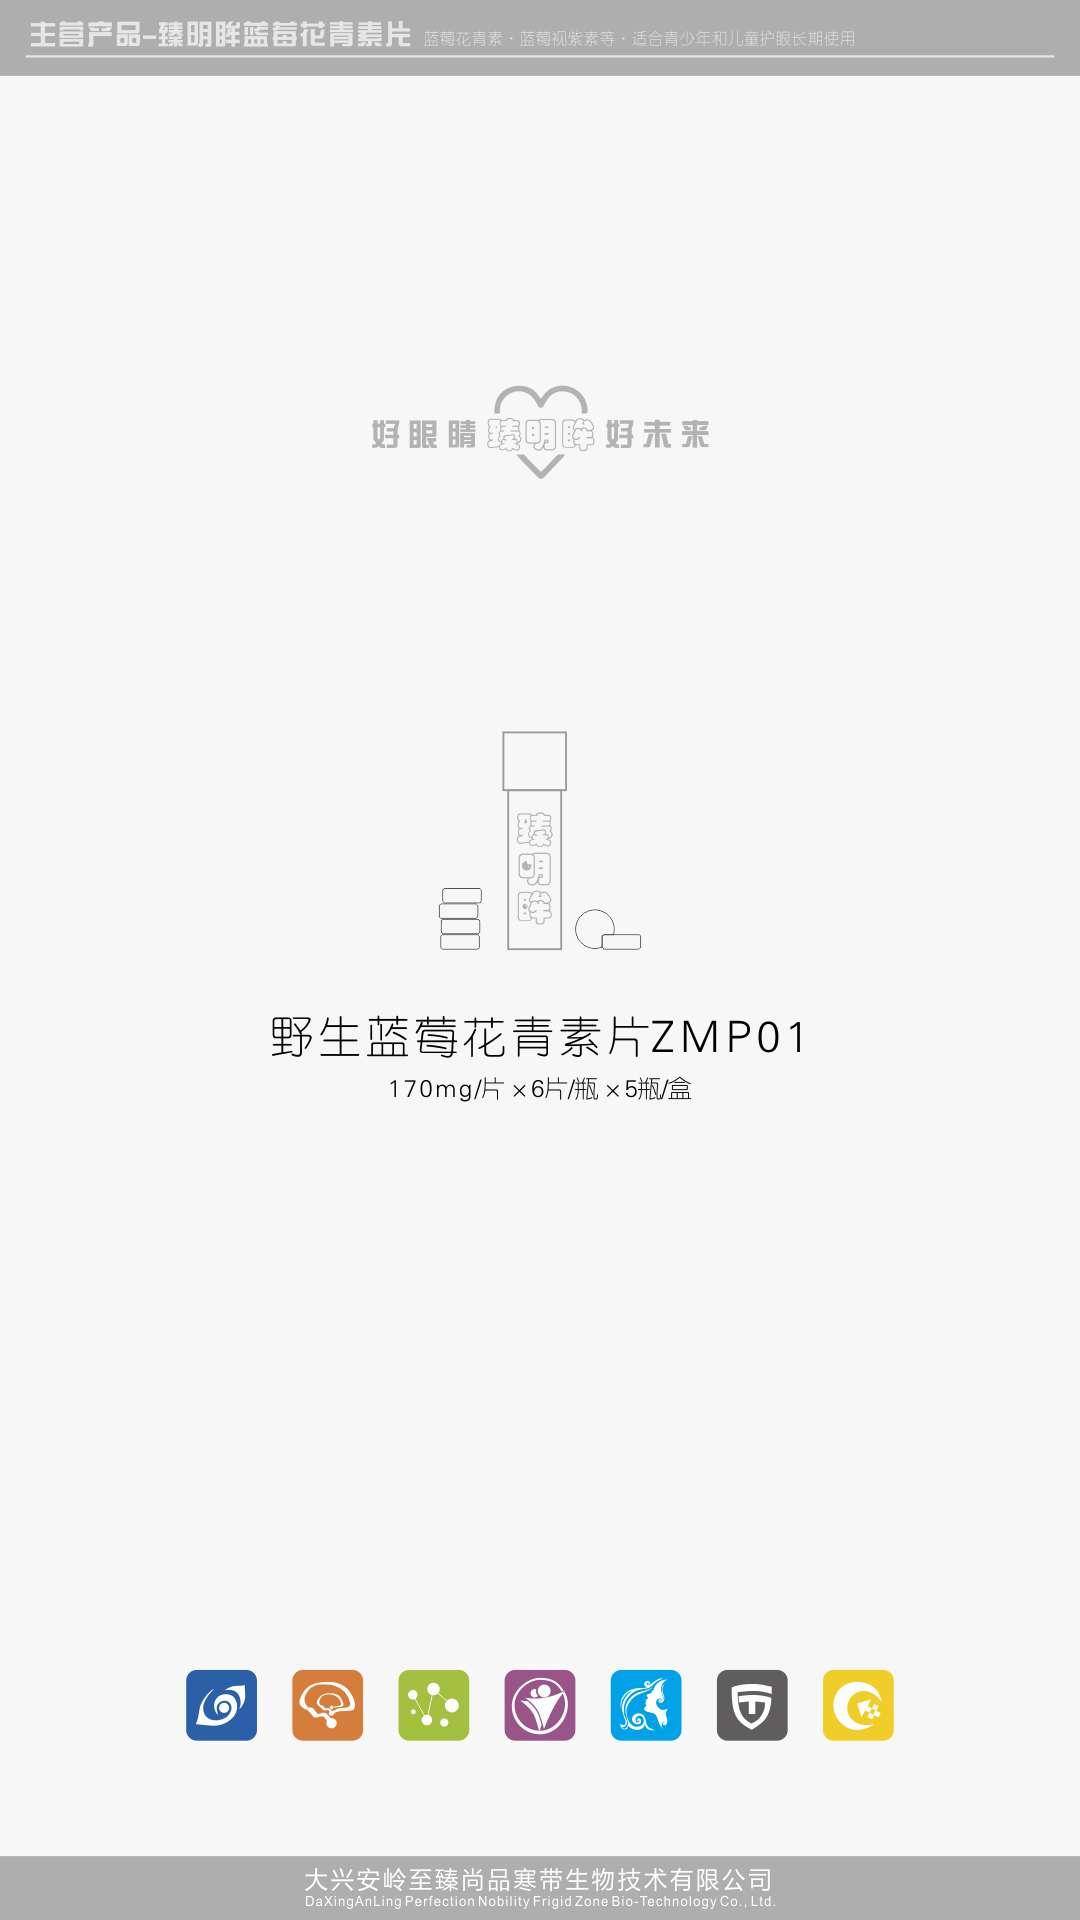 Z 至臻尚品-臻明眸藍莓花青素片-01.jpg